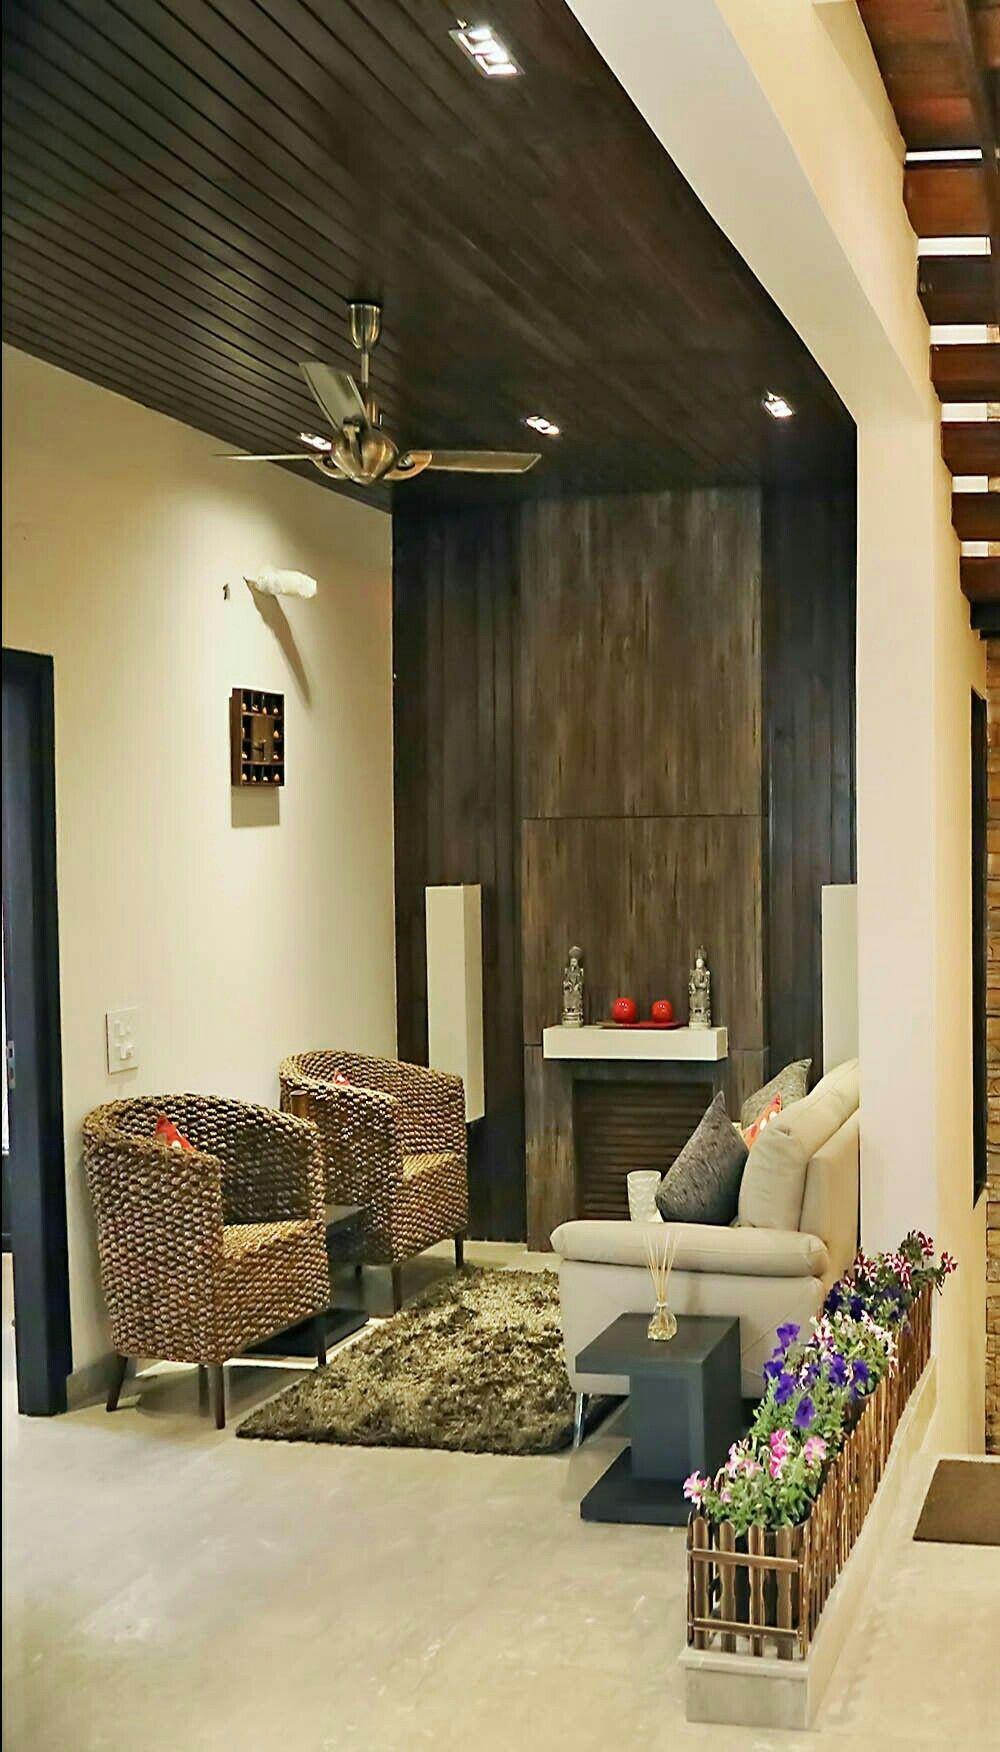 Home Decor, Room Design, Interior